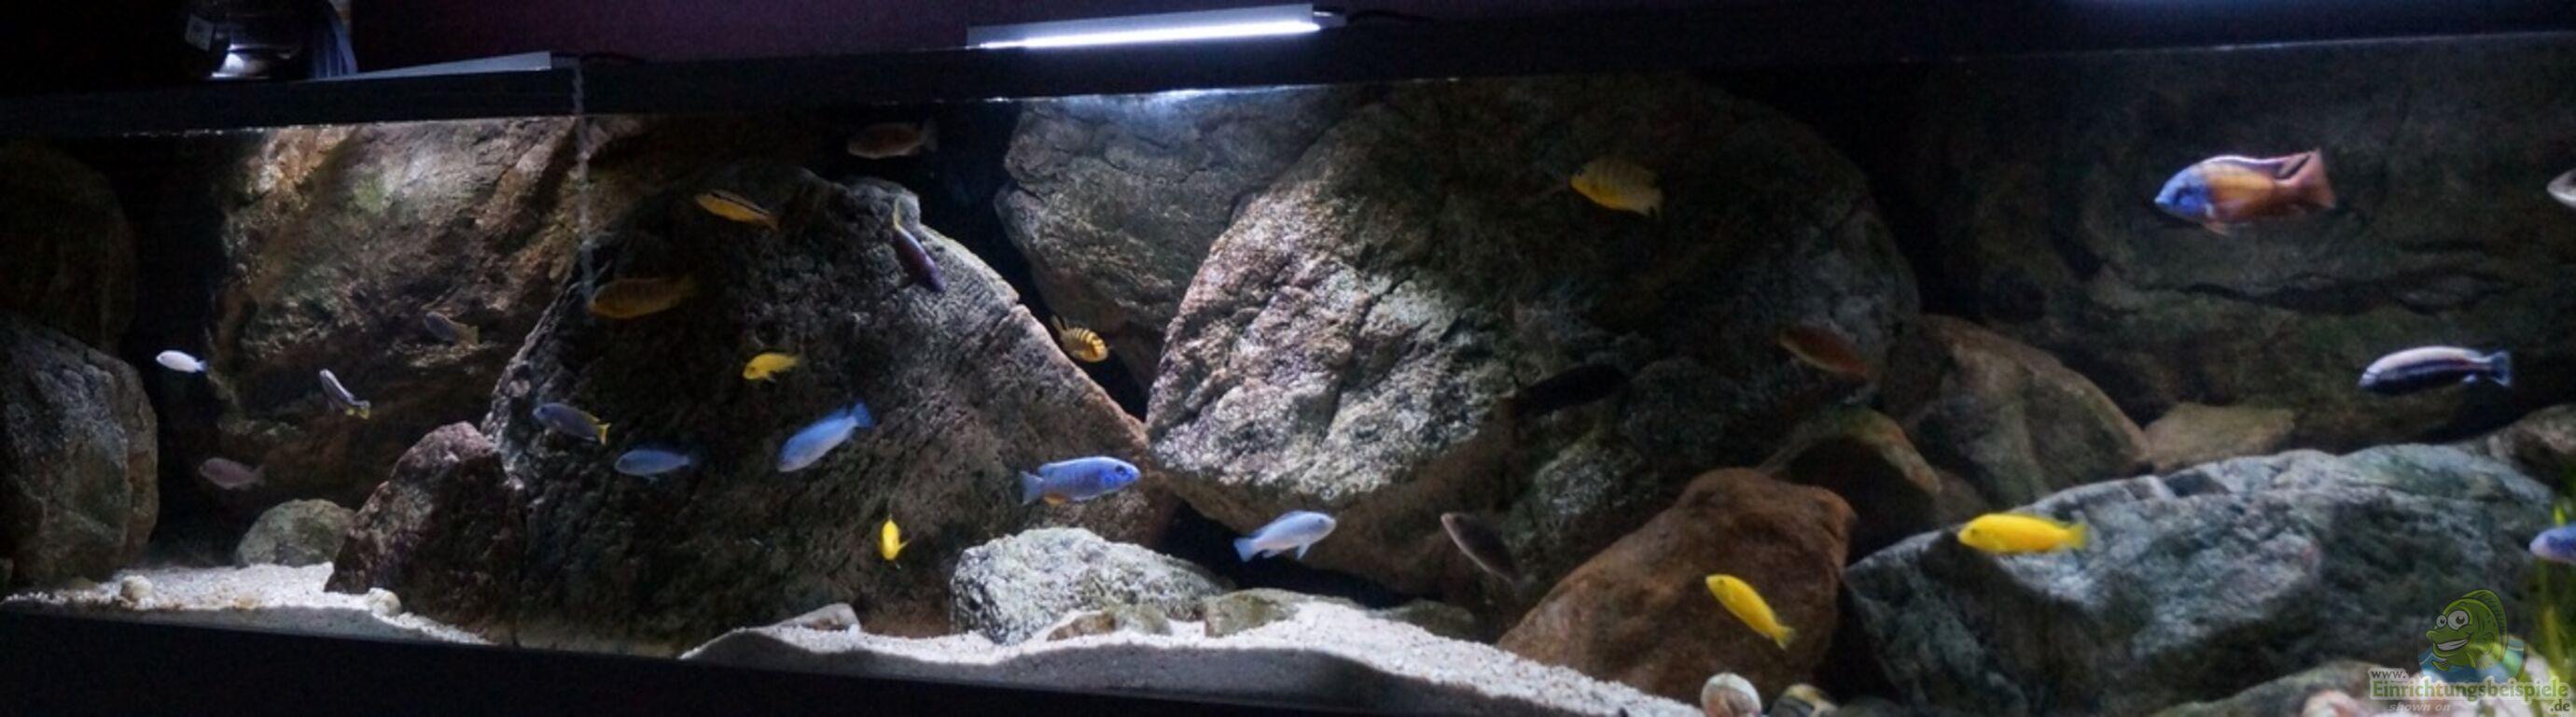 Aquarium Von Thetoxicavenger Pakati Pa Miyala